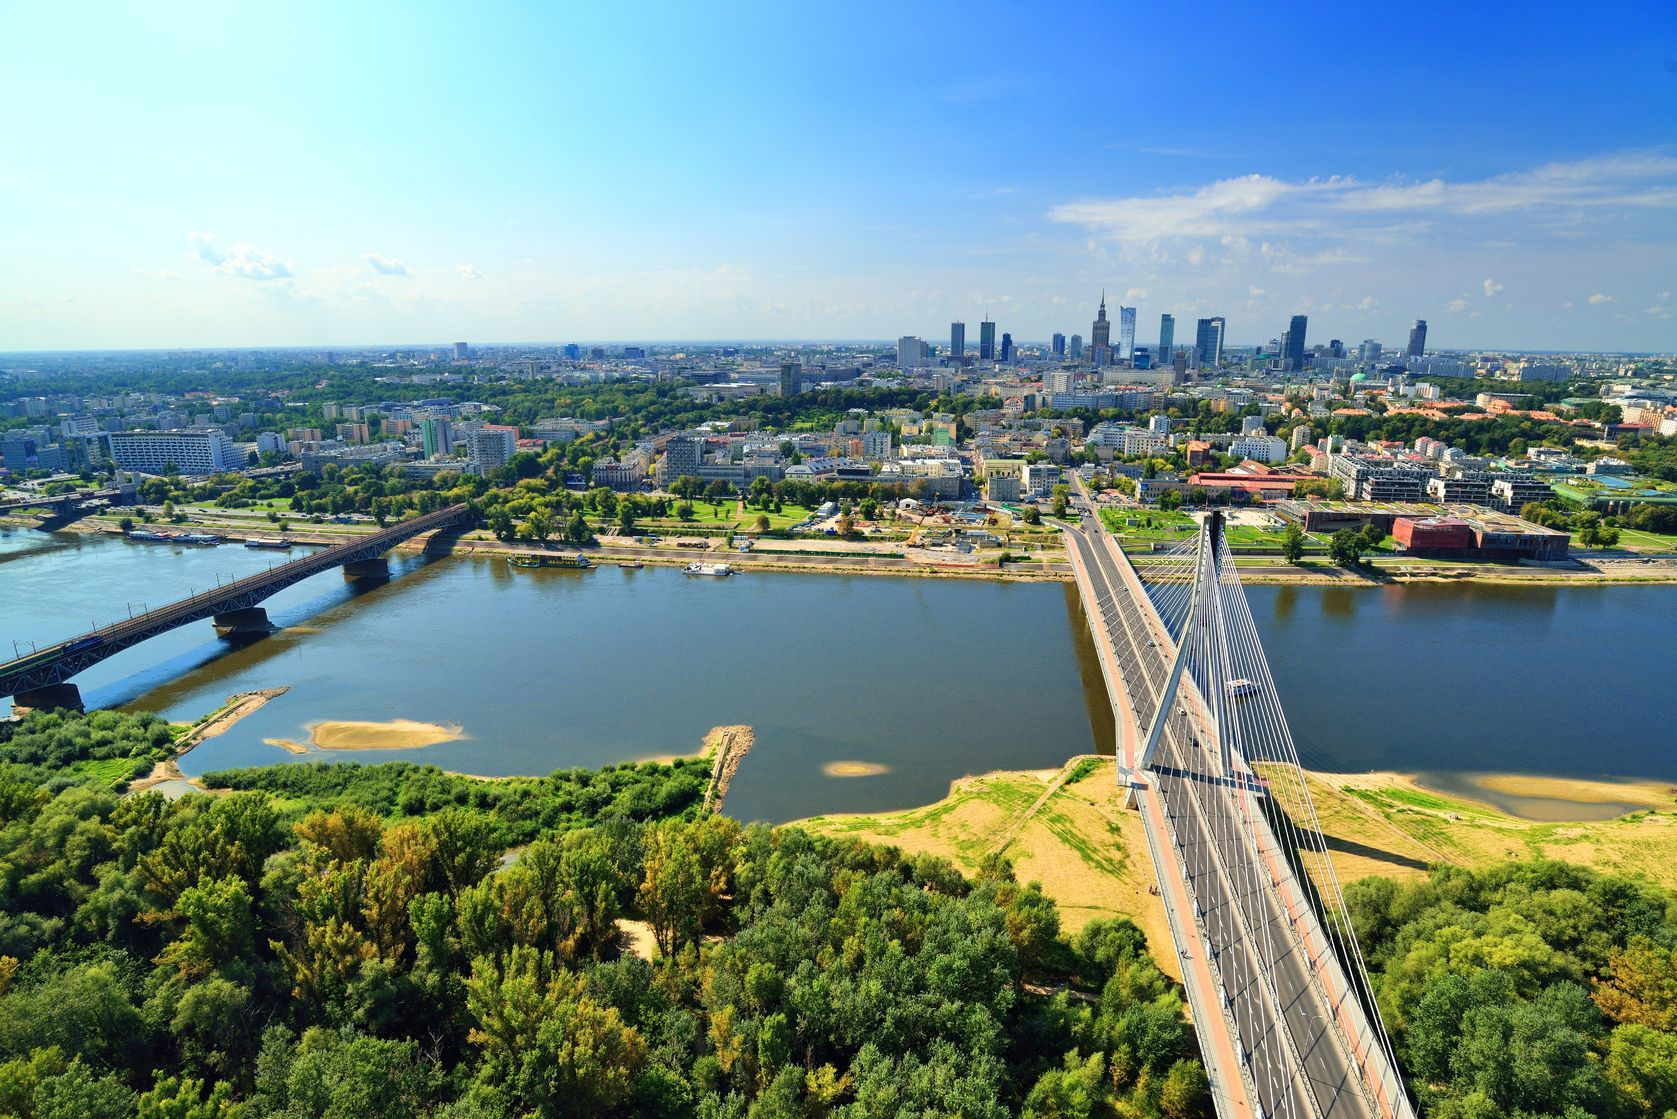 Pohled na Varšavu v Polsku | itsmejust/123RF.com